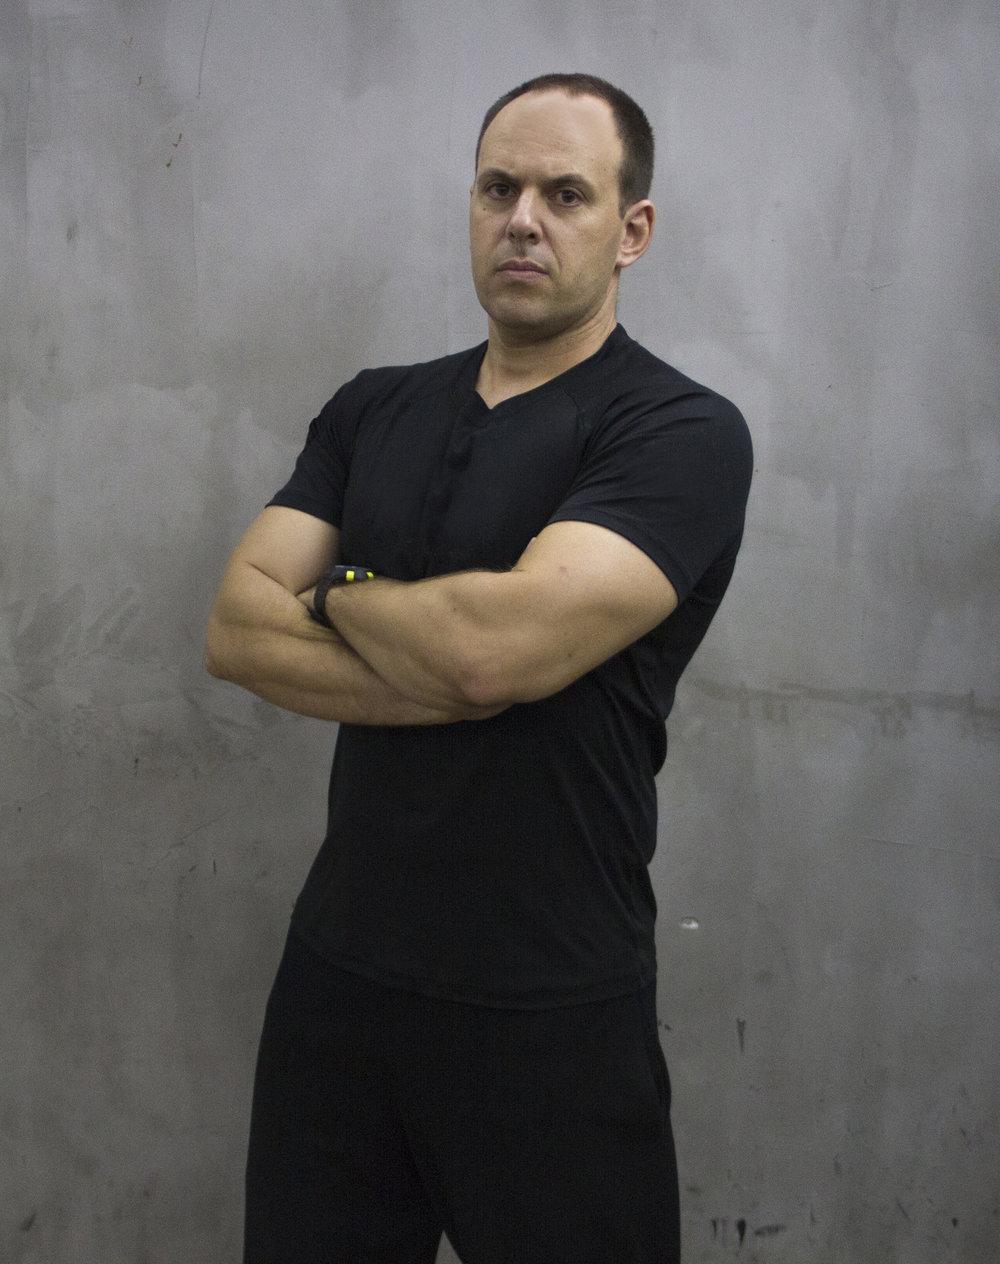 Rodrigo Nader Fernandes - CREF 5251-G/SP